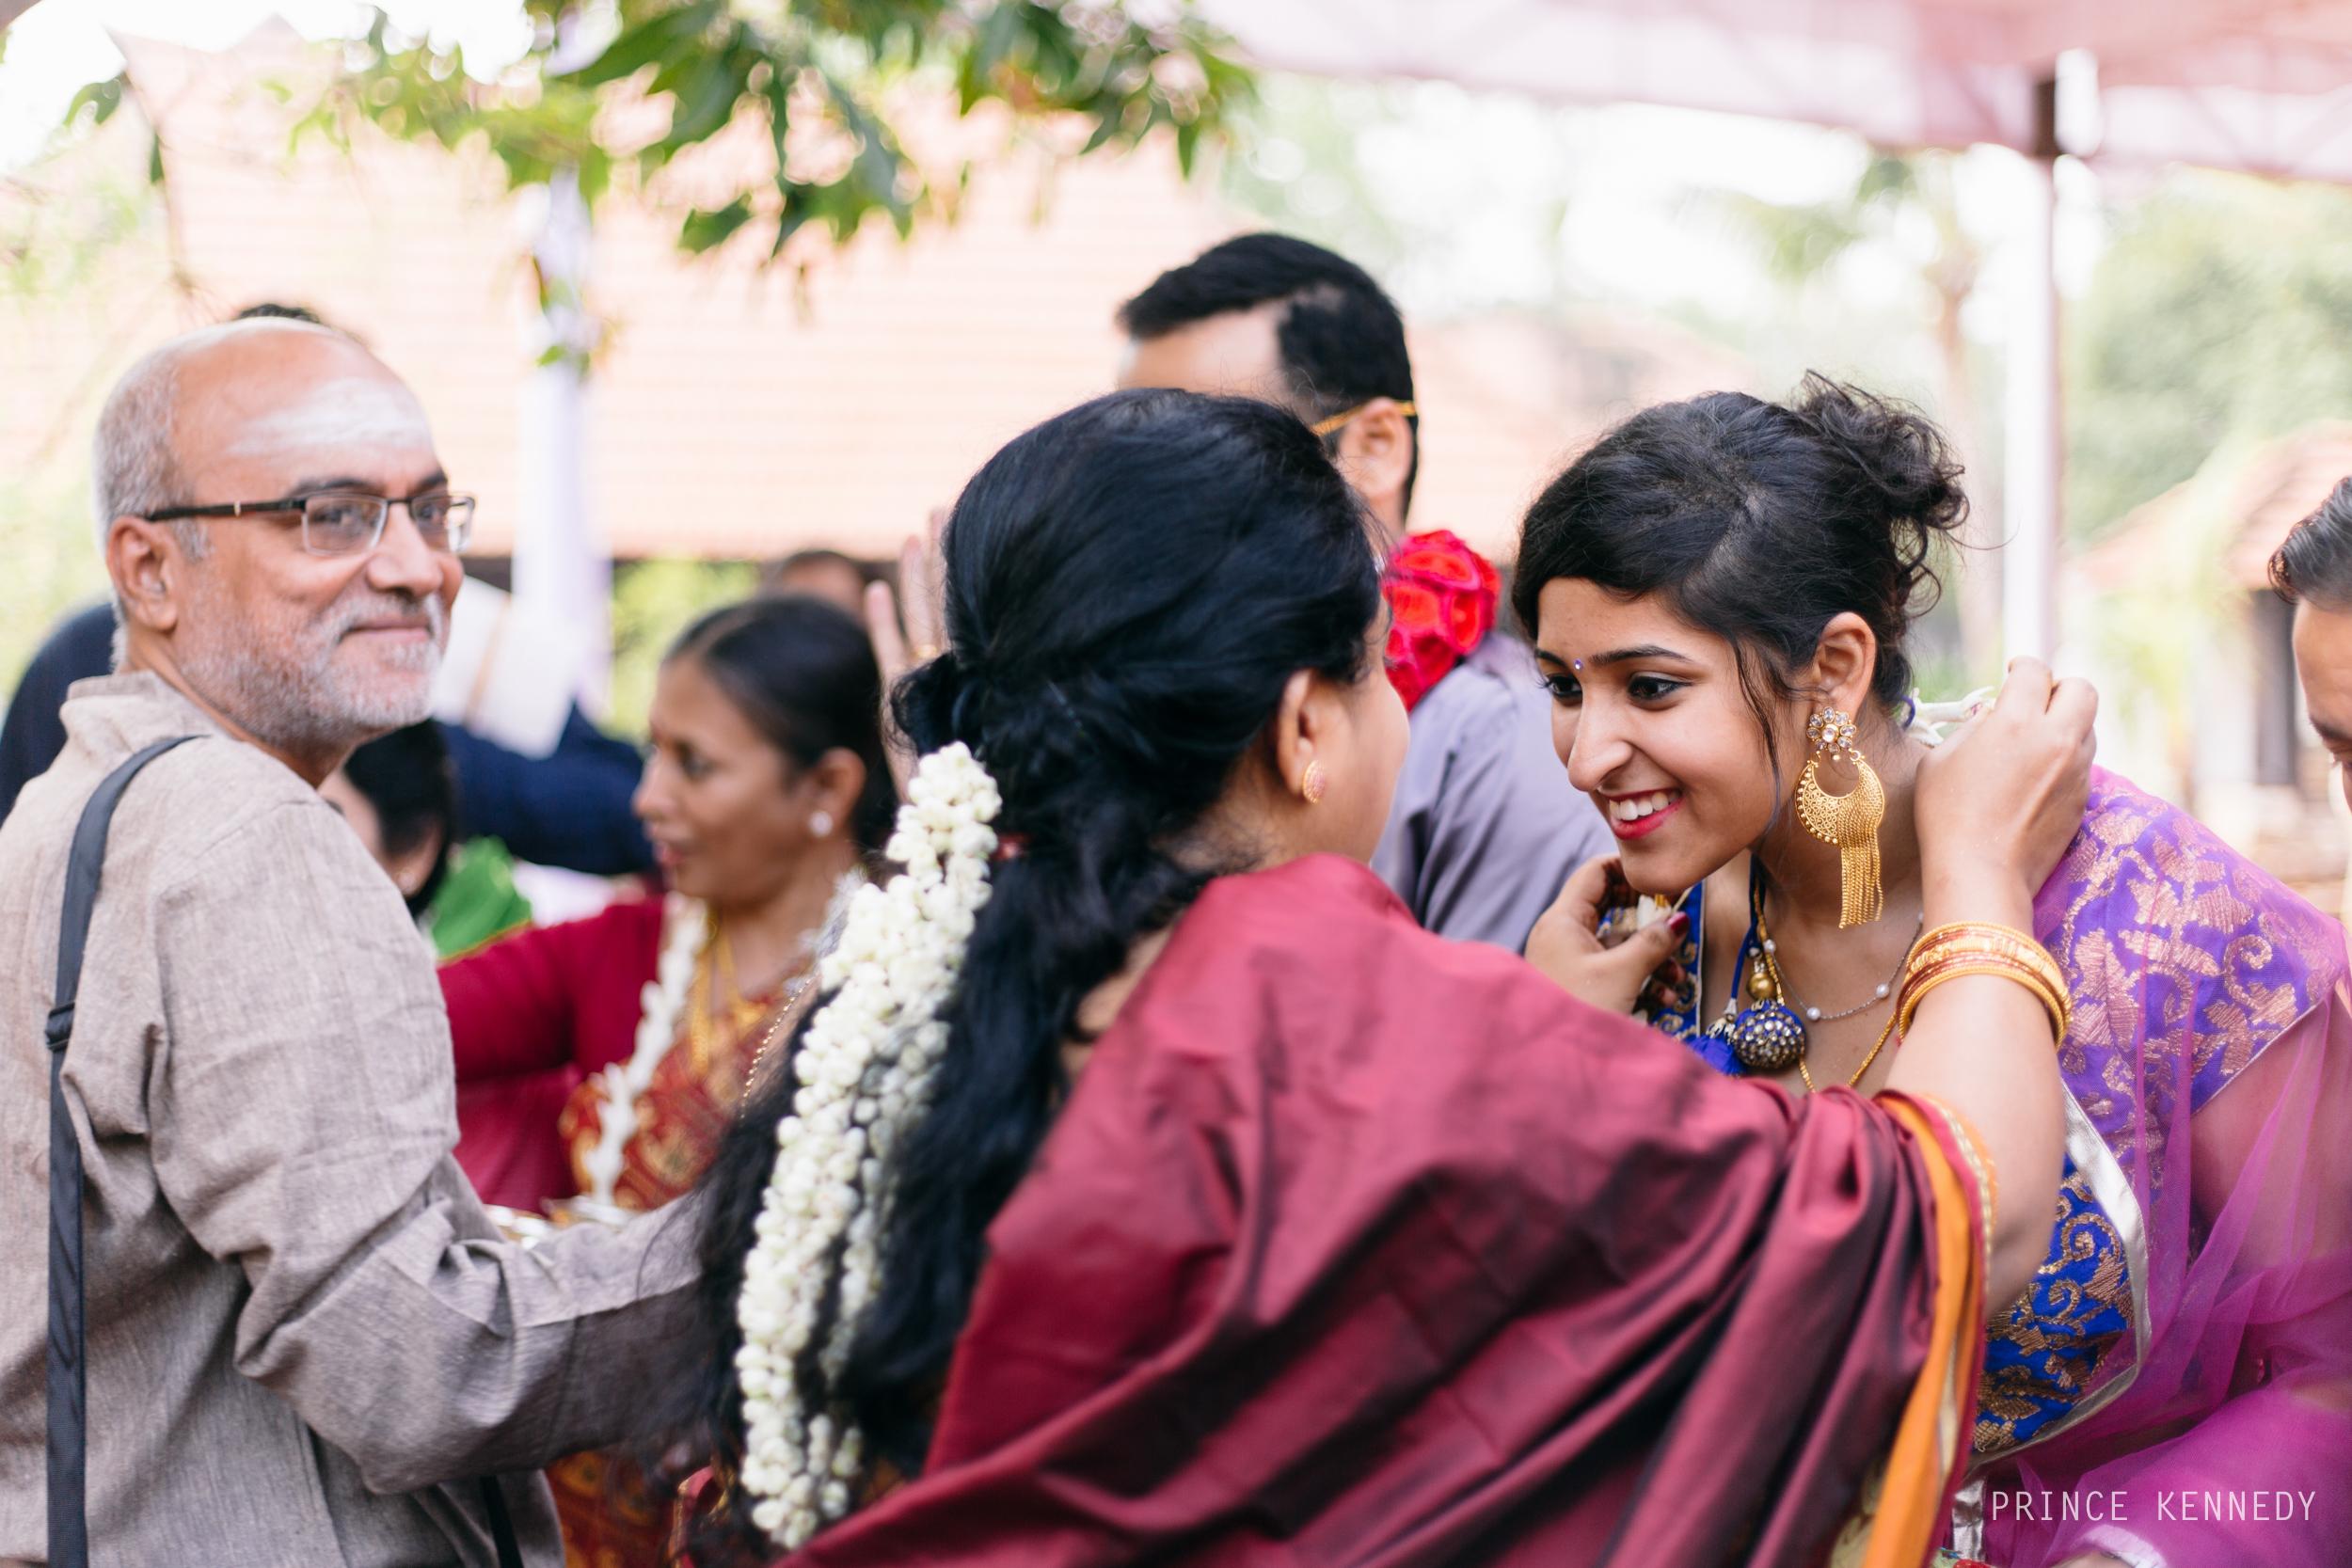 Athmajja-Nithesh-Engagement-Couple-Portrait-Portraiture-Wedding-Couple-Portrait-Chennai-Photographer-Candid-Photography-Destination-Best-Prince-Kennedy-Photography-83.jpg